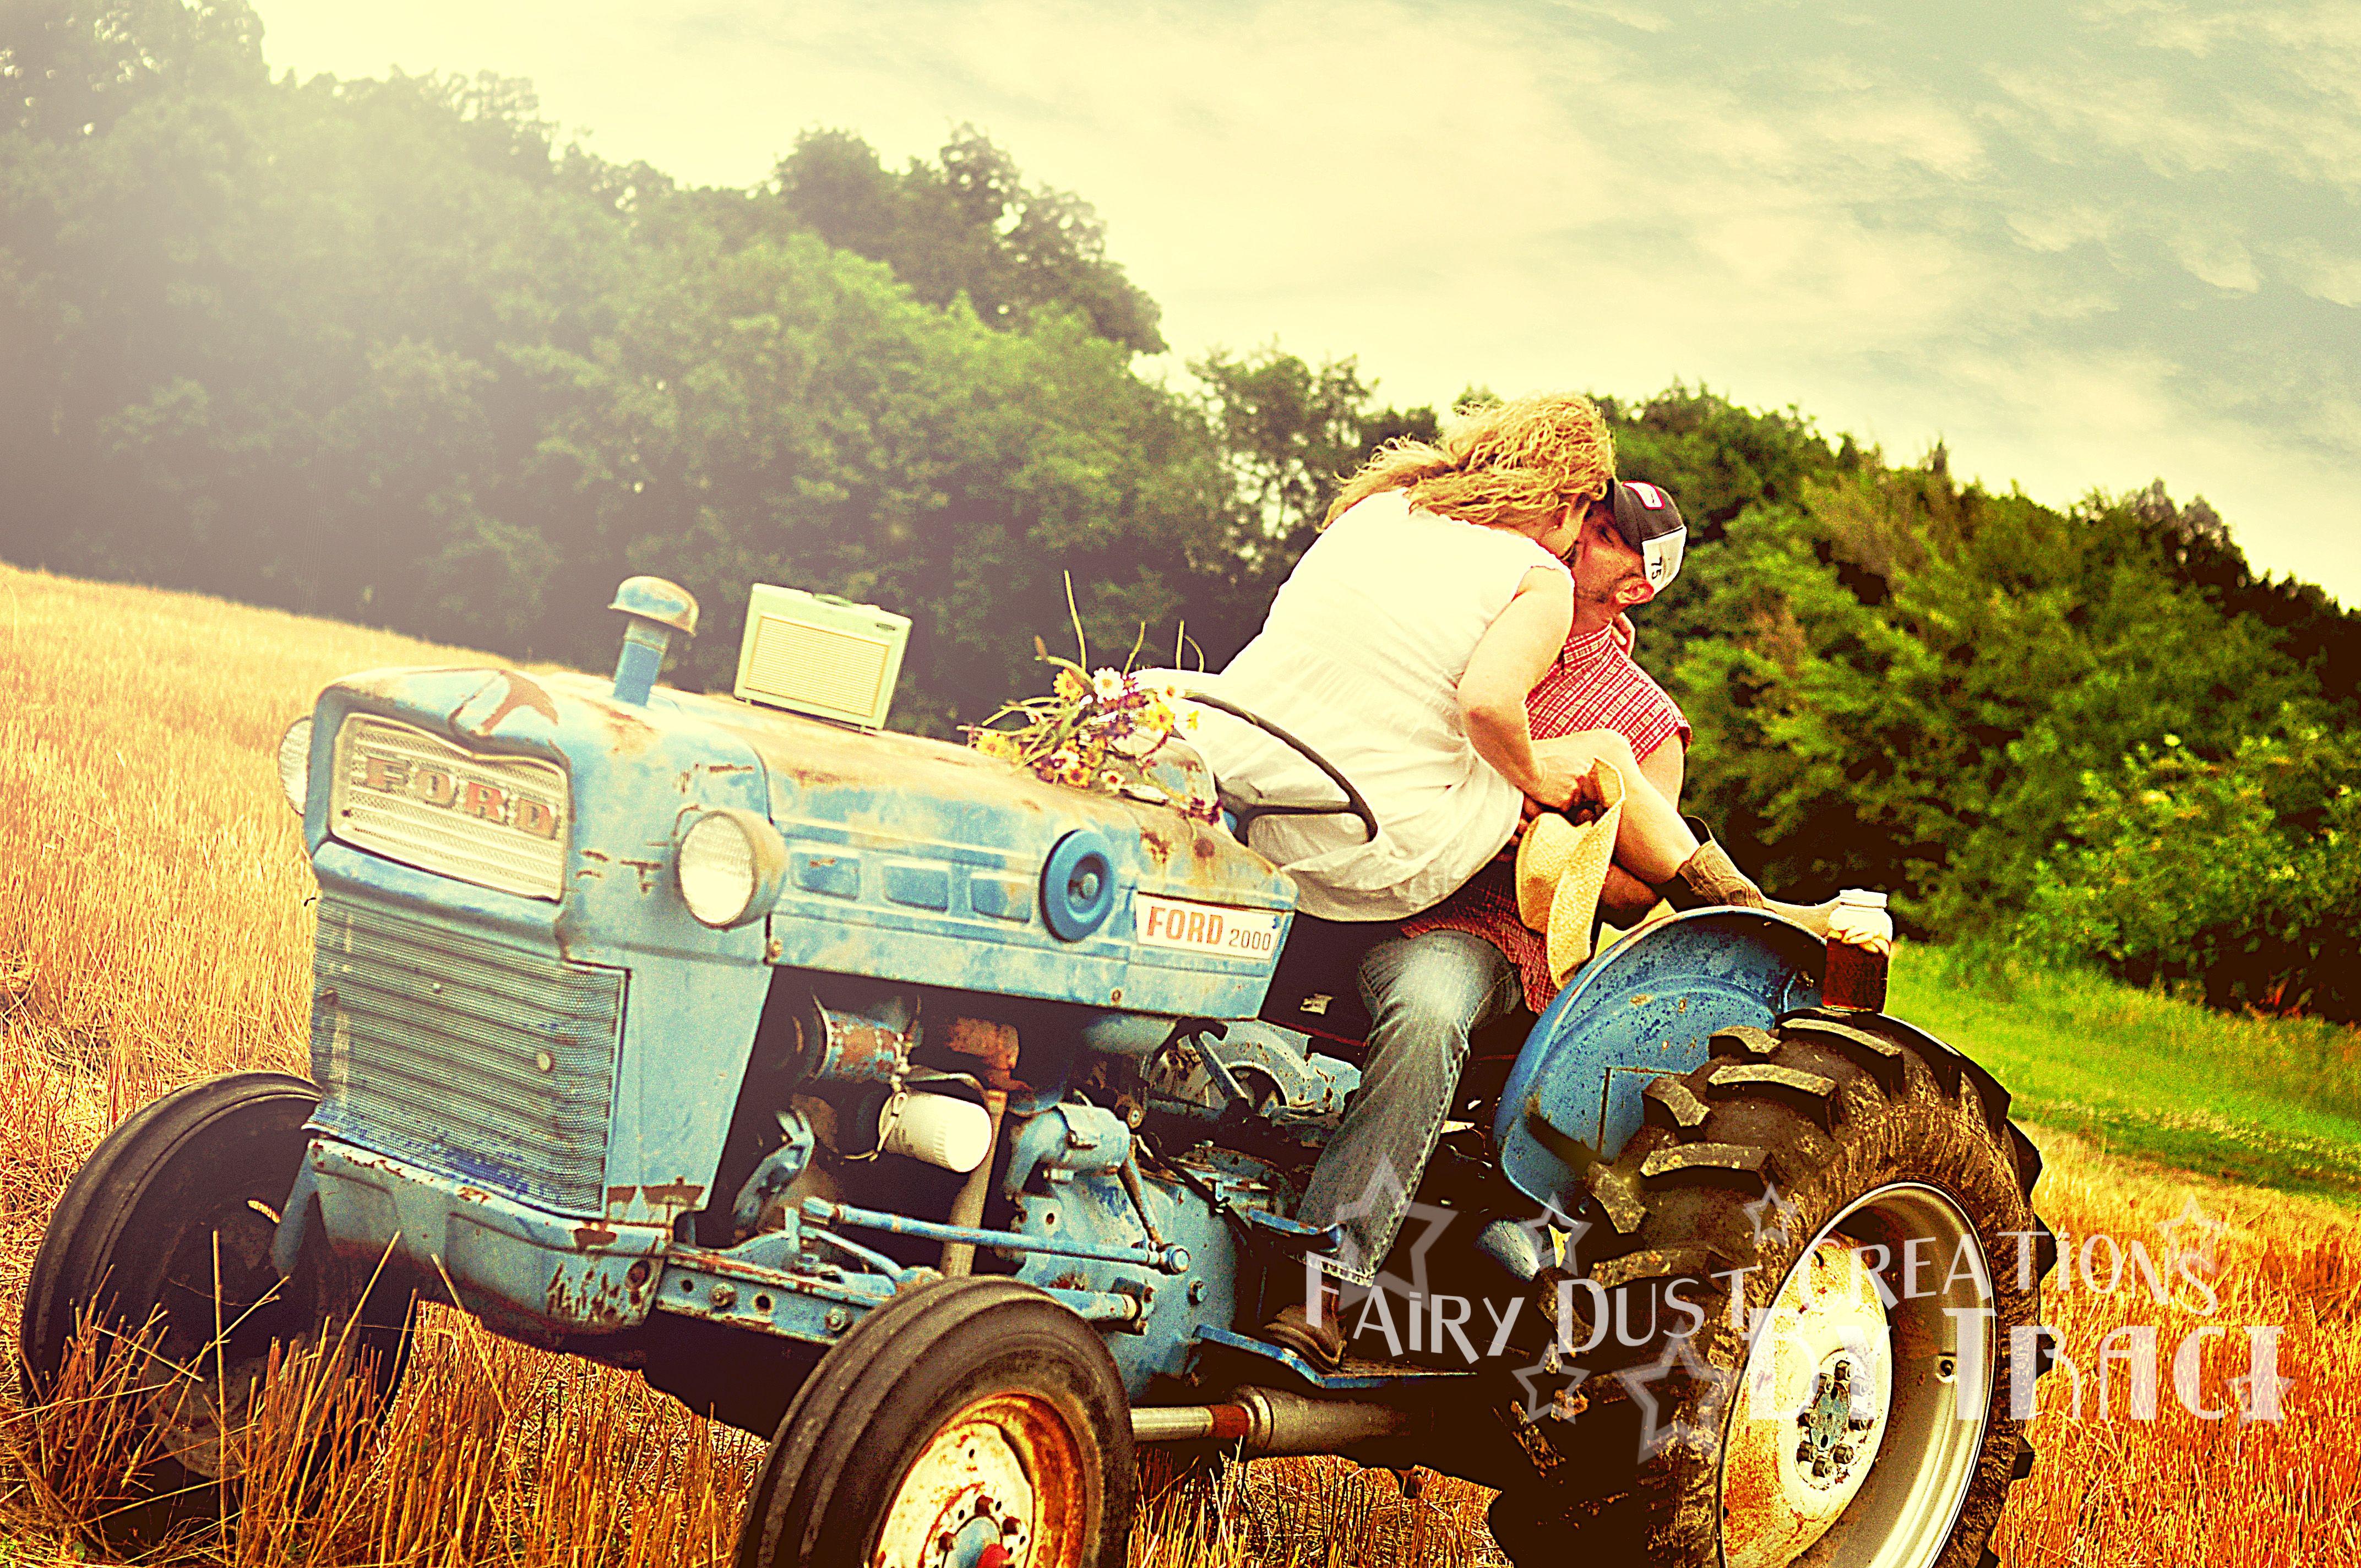 Couple On Tractor : Couple tractor farm http fairydustcreationsbytraci